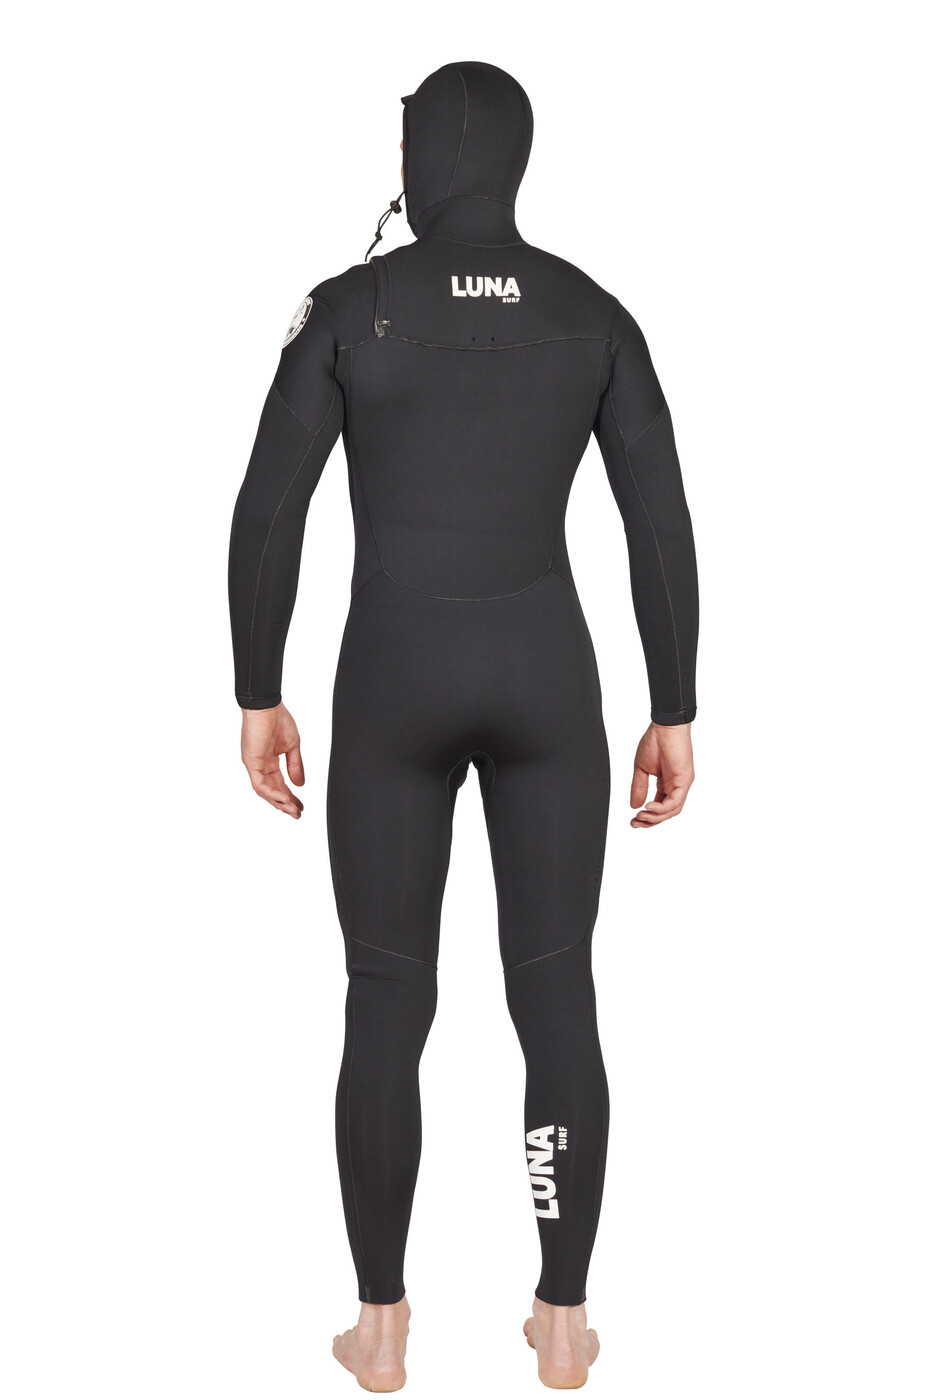 Lunasurf Mens 5.4mm Hooded Slant Zip Yamamoto Wetsuit